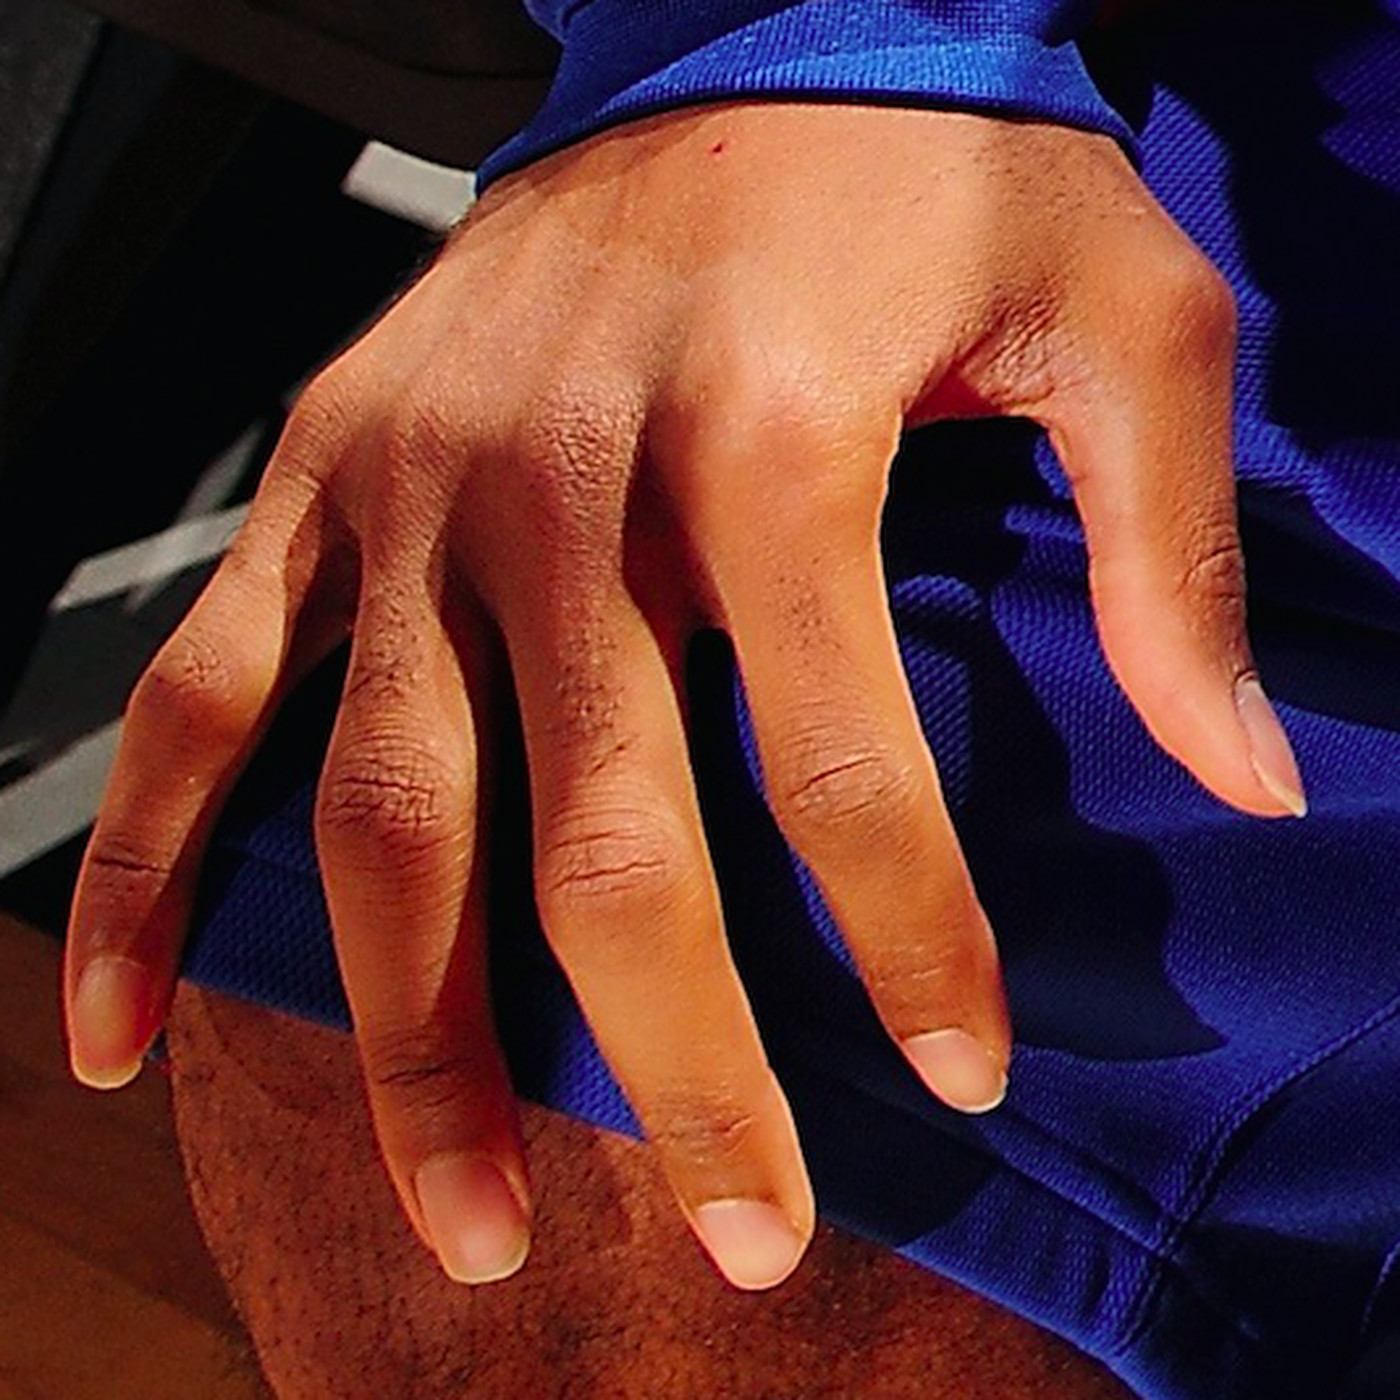 Dear basketball players, please cut your fingernails